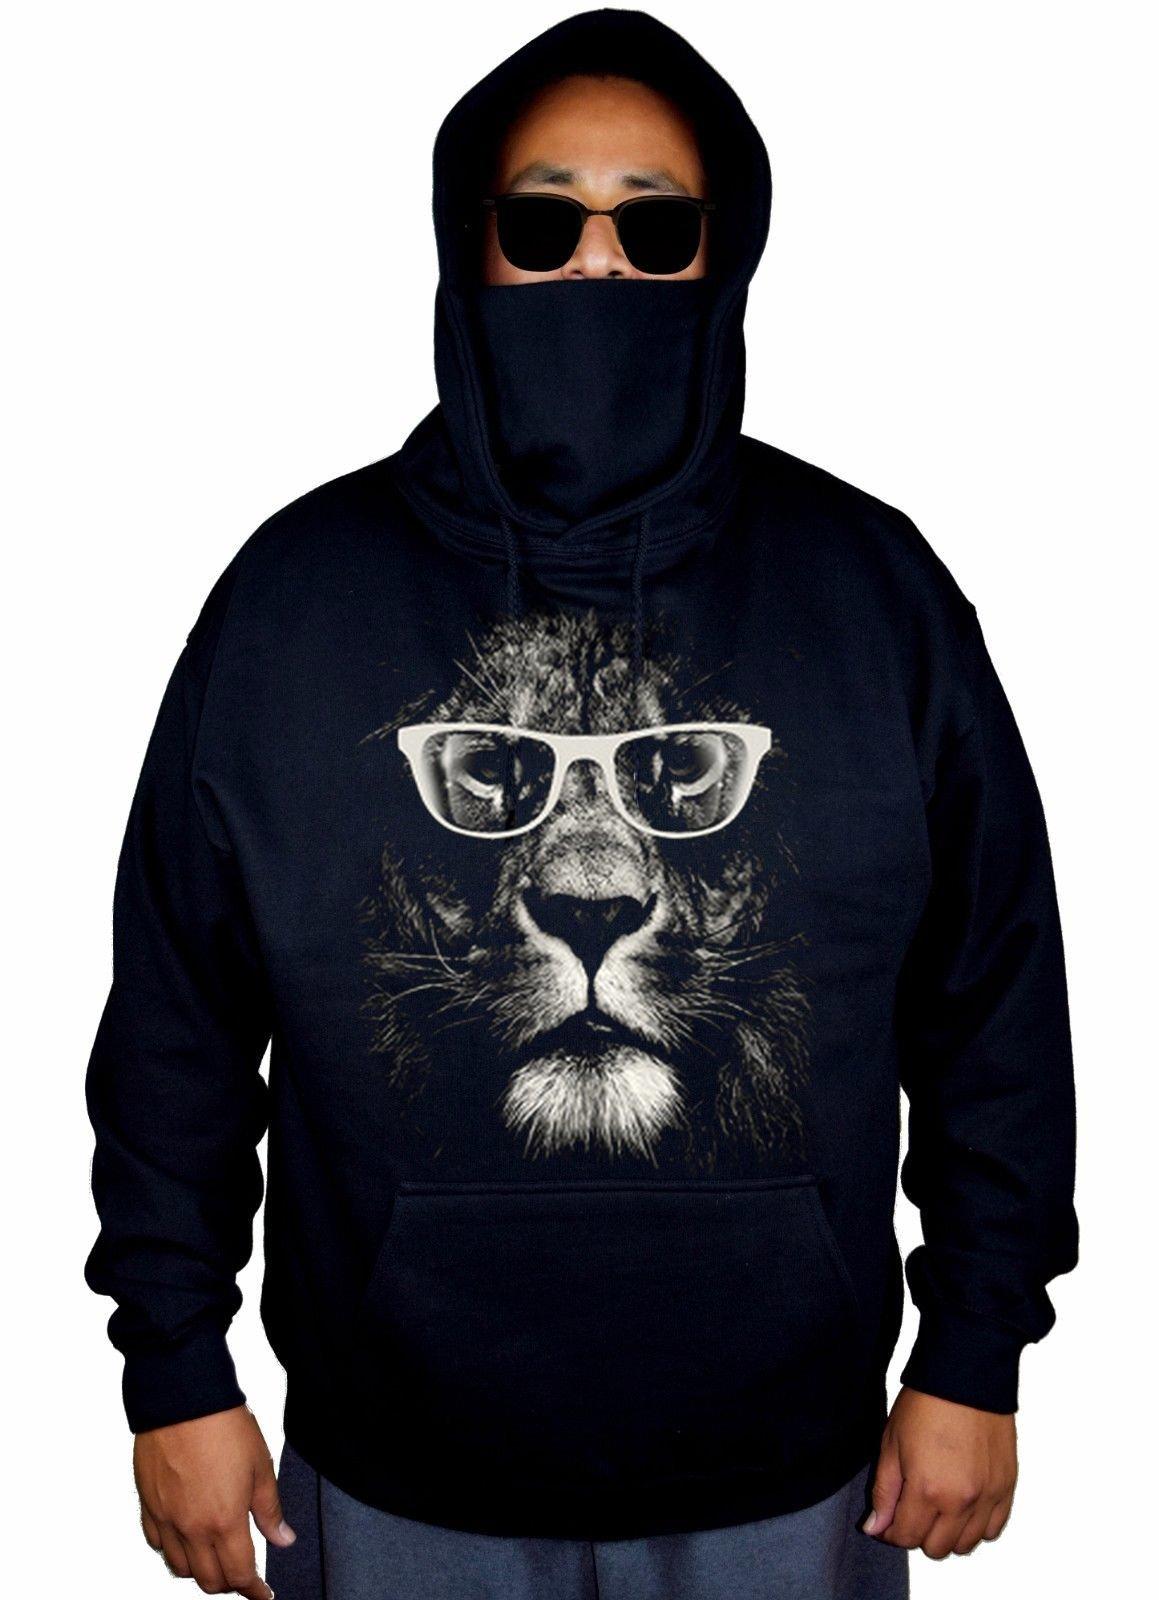 Men's Lion Glasses Black Mask Hoodie Sweater 2X-Large Black